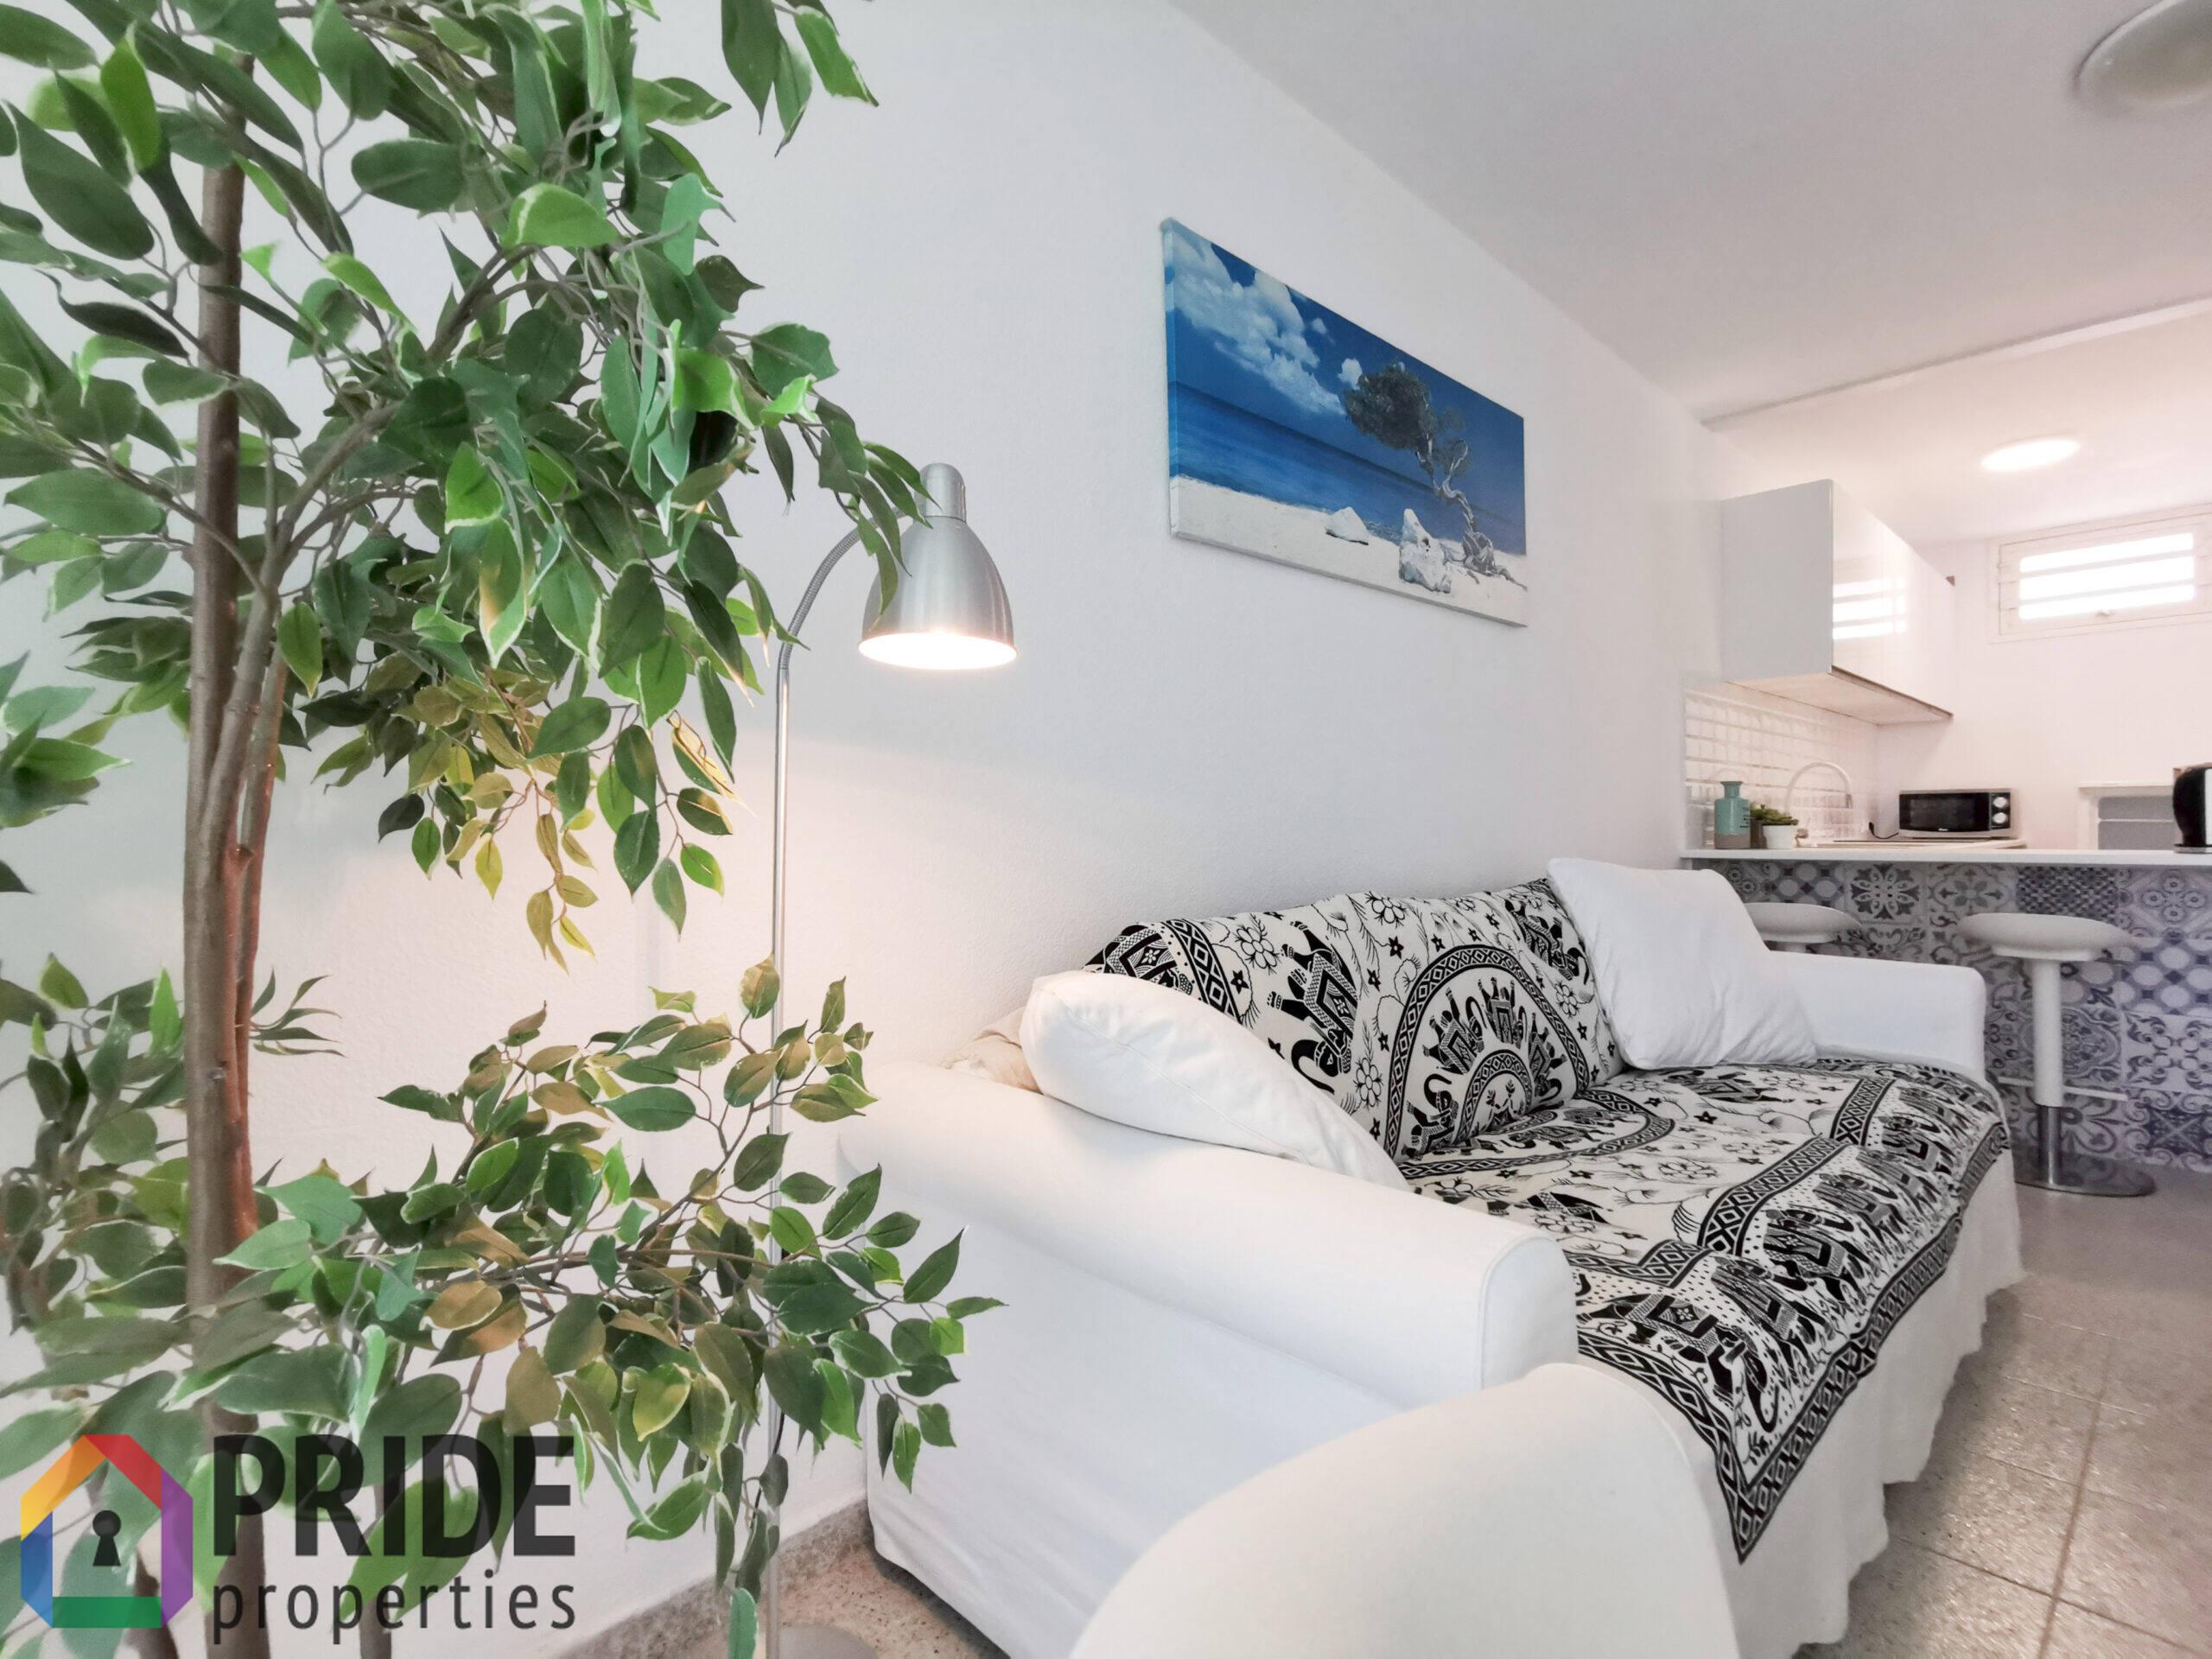 2 Bedroom Apartment Playa del Ingles